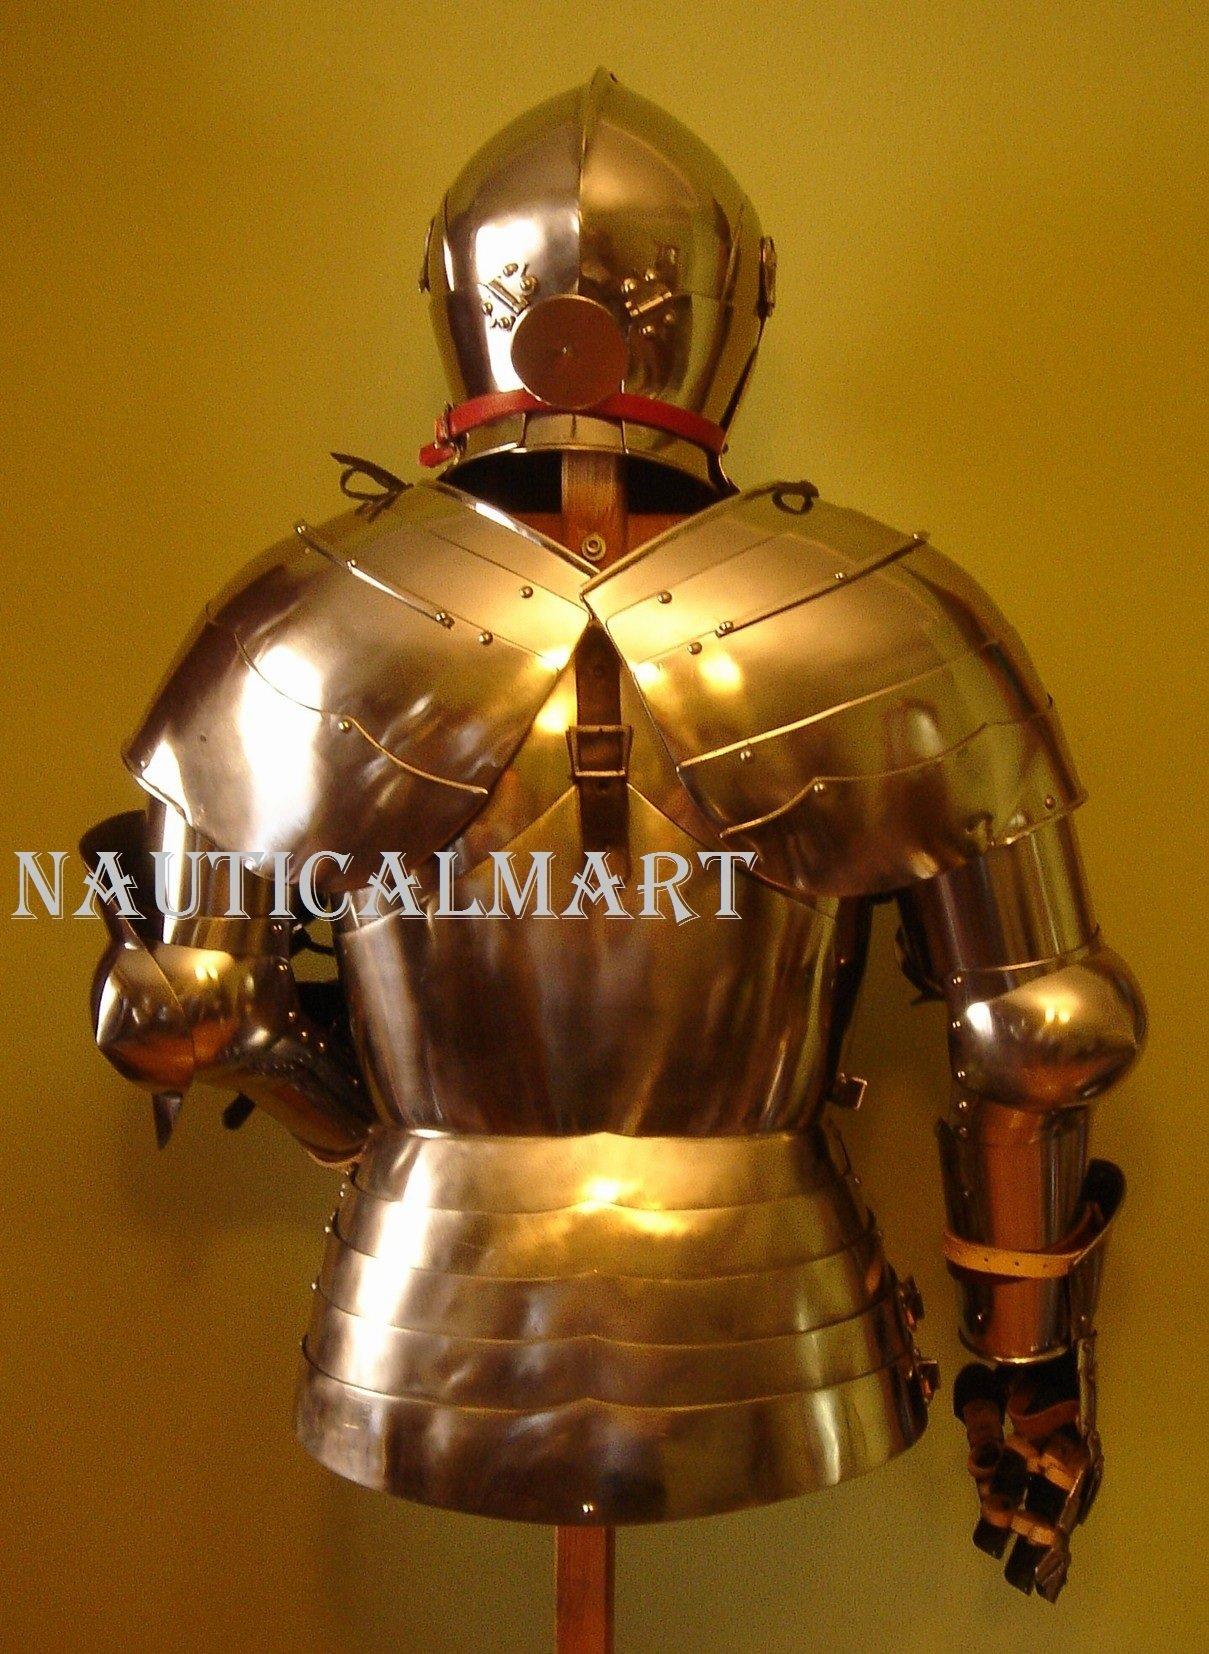 Armor Costume Steel Medieval Suit of Armor Breastplate with Helmet by NAUTICALMART (Image #3)